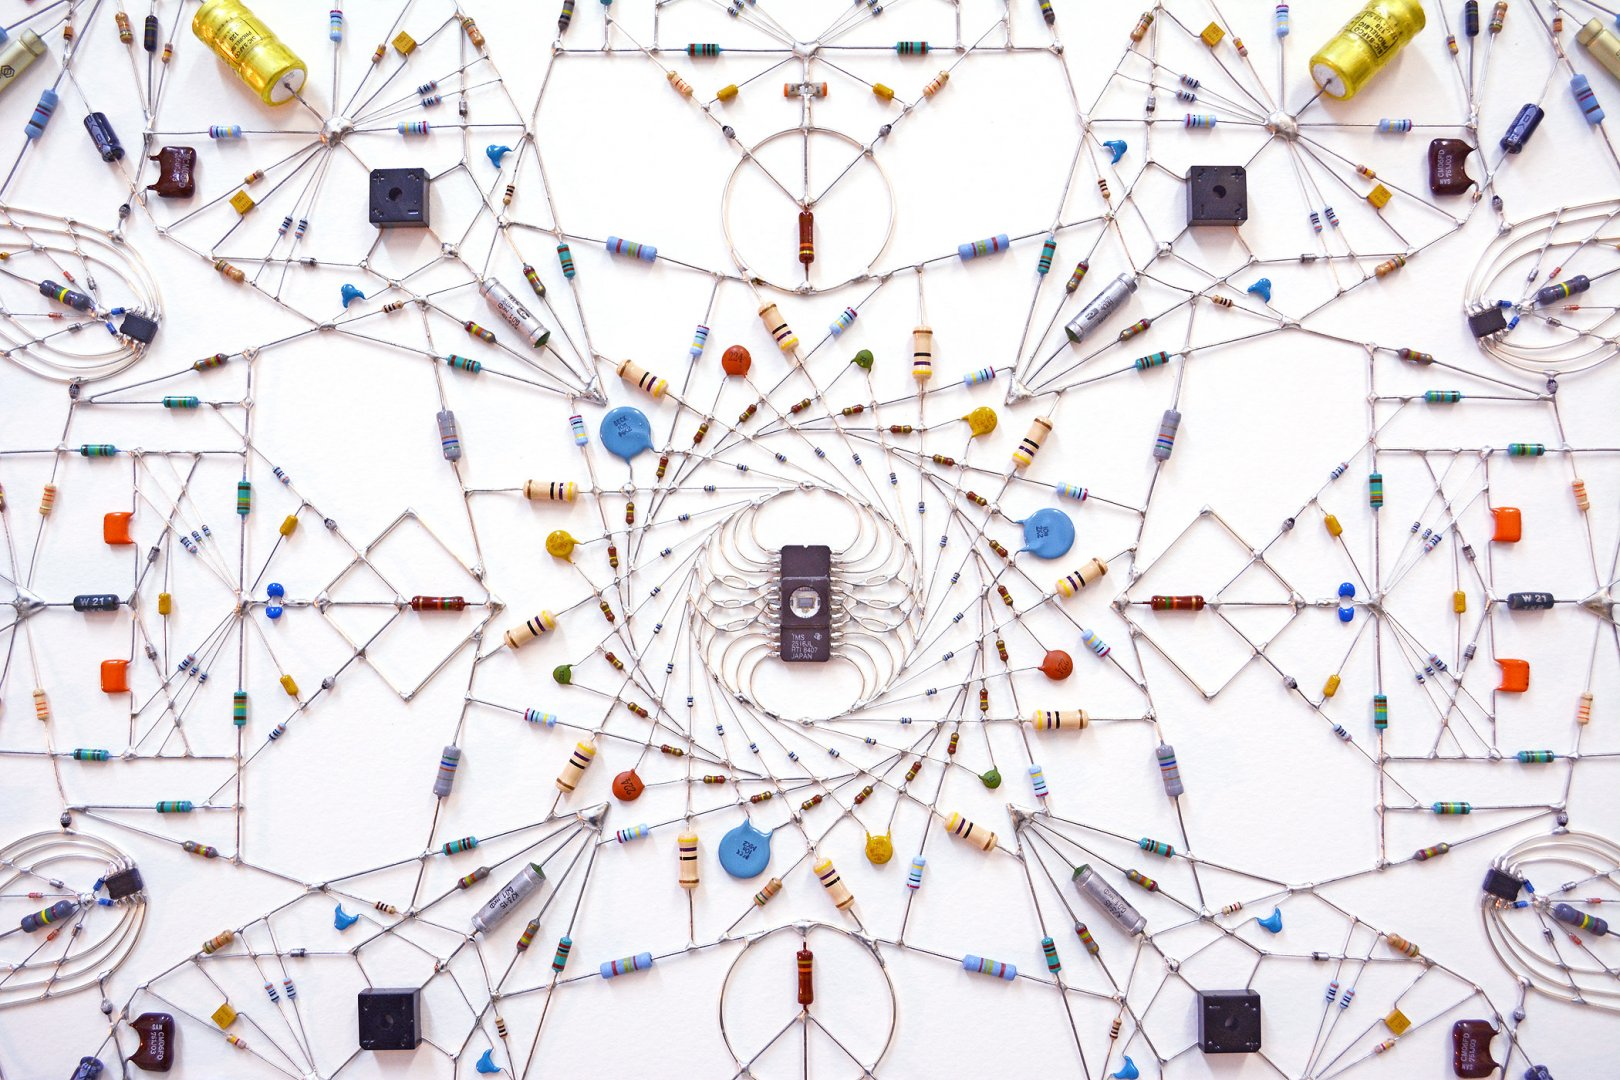 Leonardo Ulian's Technological mandala 53 – Vortex ( source )  OKElectronic components, copper wire, paper, wood frame, 102 cm x 102 cm, 2015